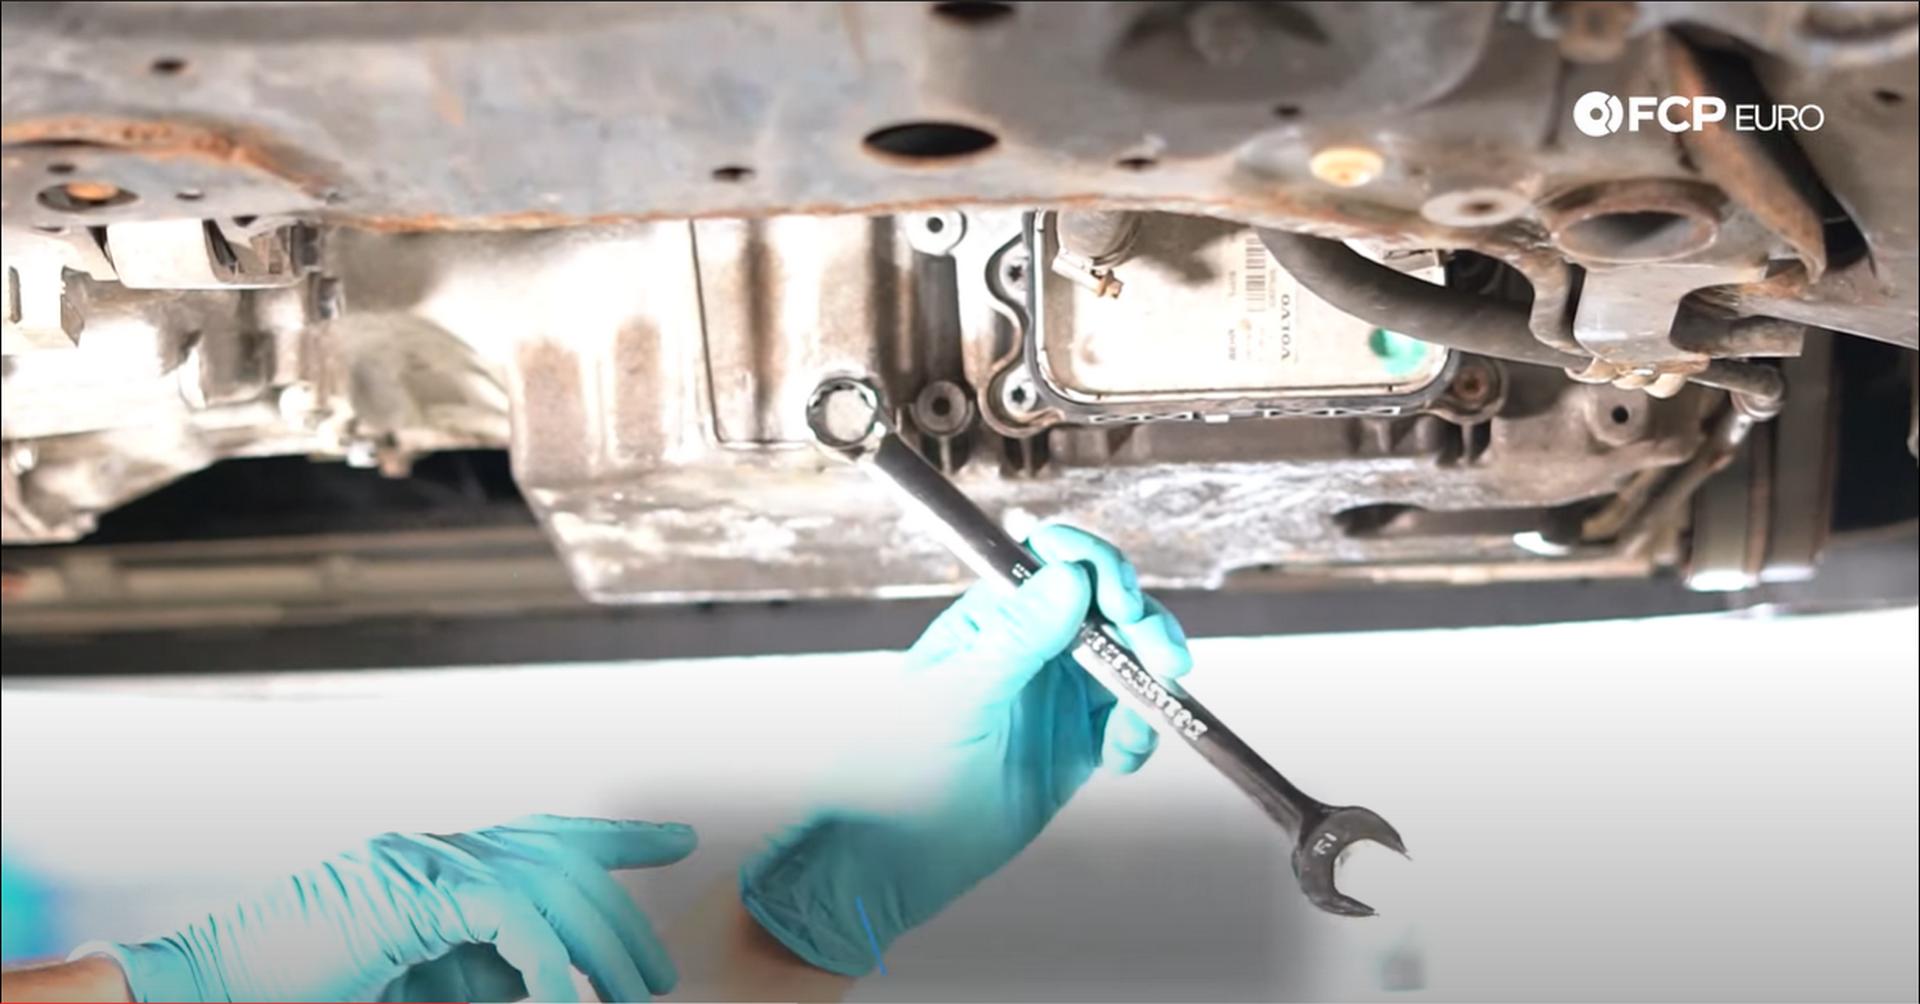 04_DIY_Volvo_Oil_Change-Loosening-Drain-Plug